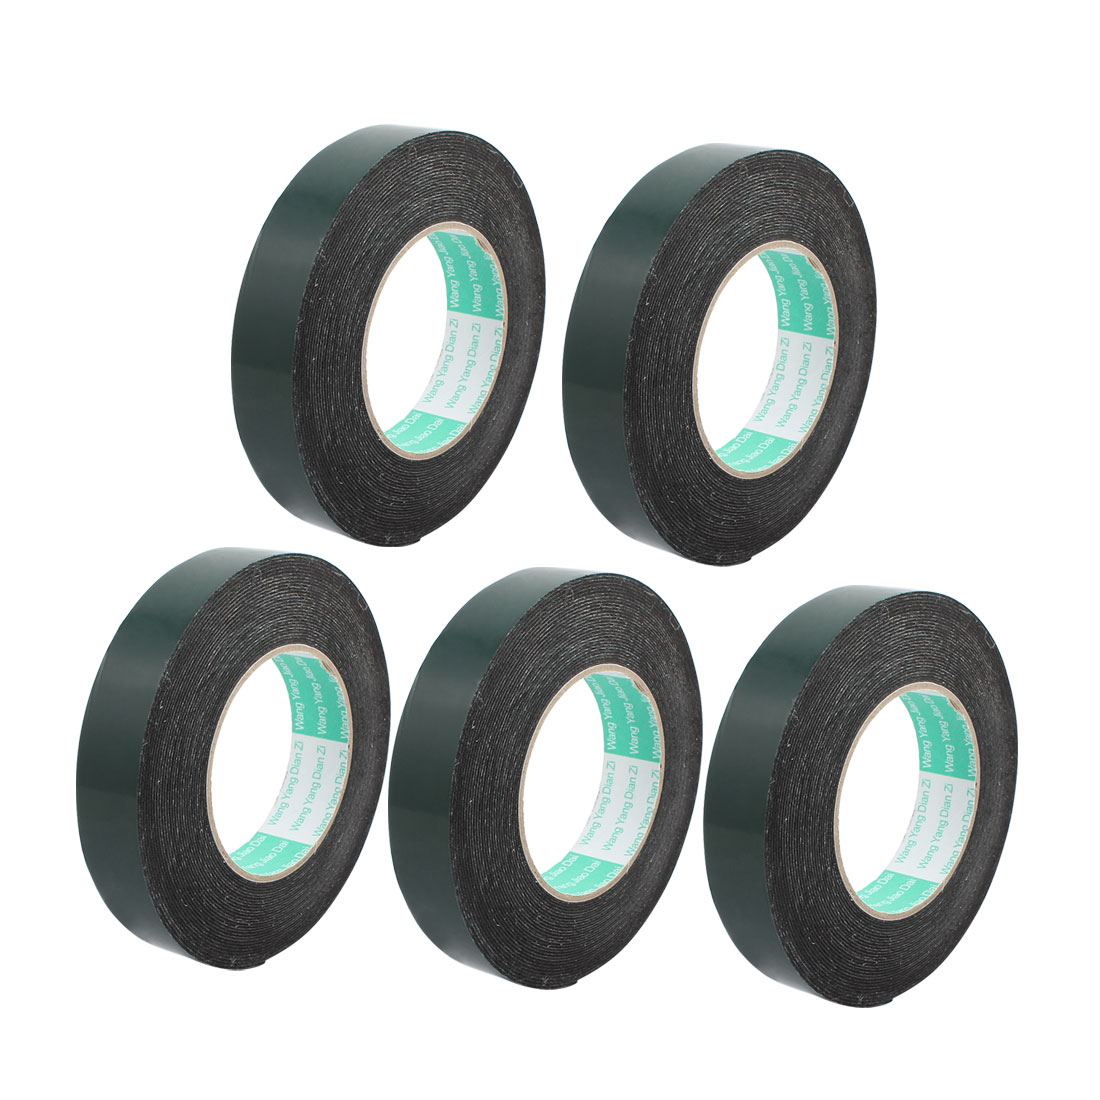 5Pcs 25mmx1mm Double Sided Sponge Tape Adhesive Sticker Foam Glue Strip 10m